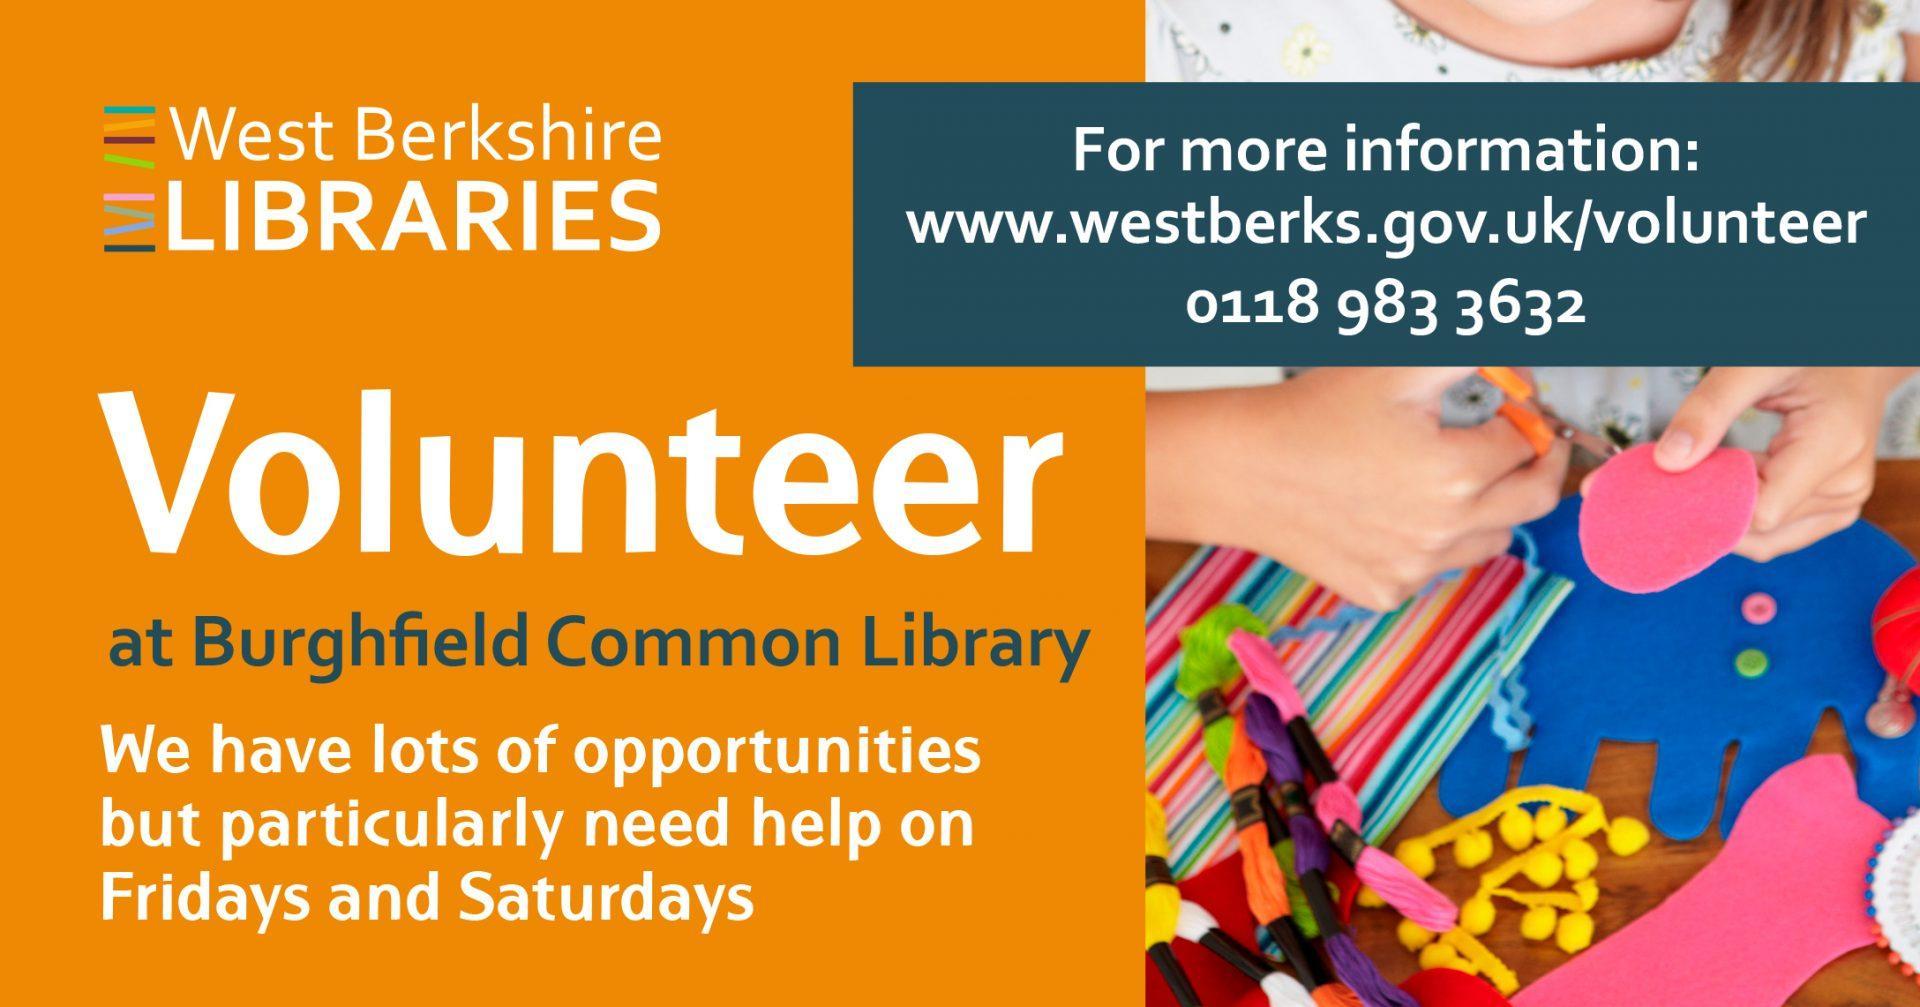 https://burghfieldparishcouncil.gov.uk/wp-content/uploads/2019/11/Burghfield-Library-volunteer.jpg